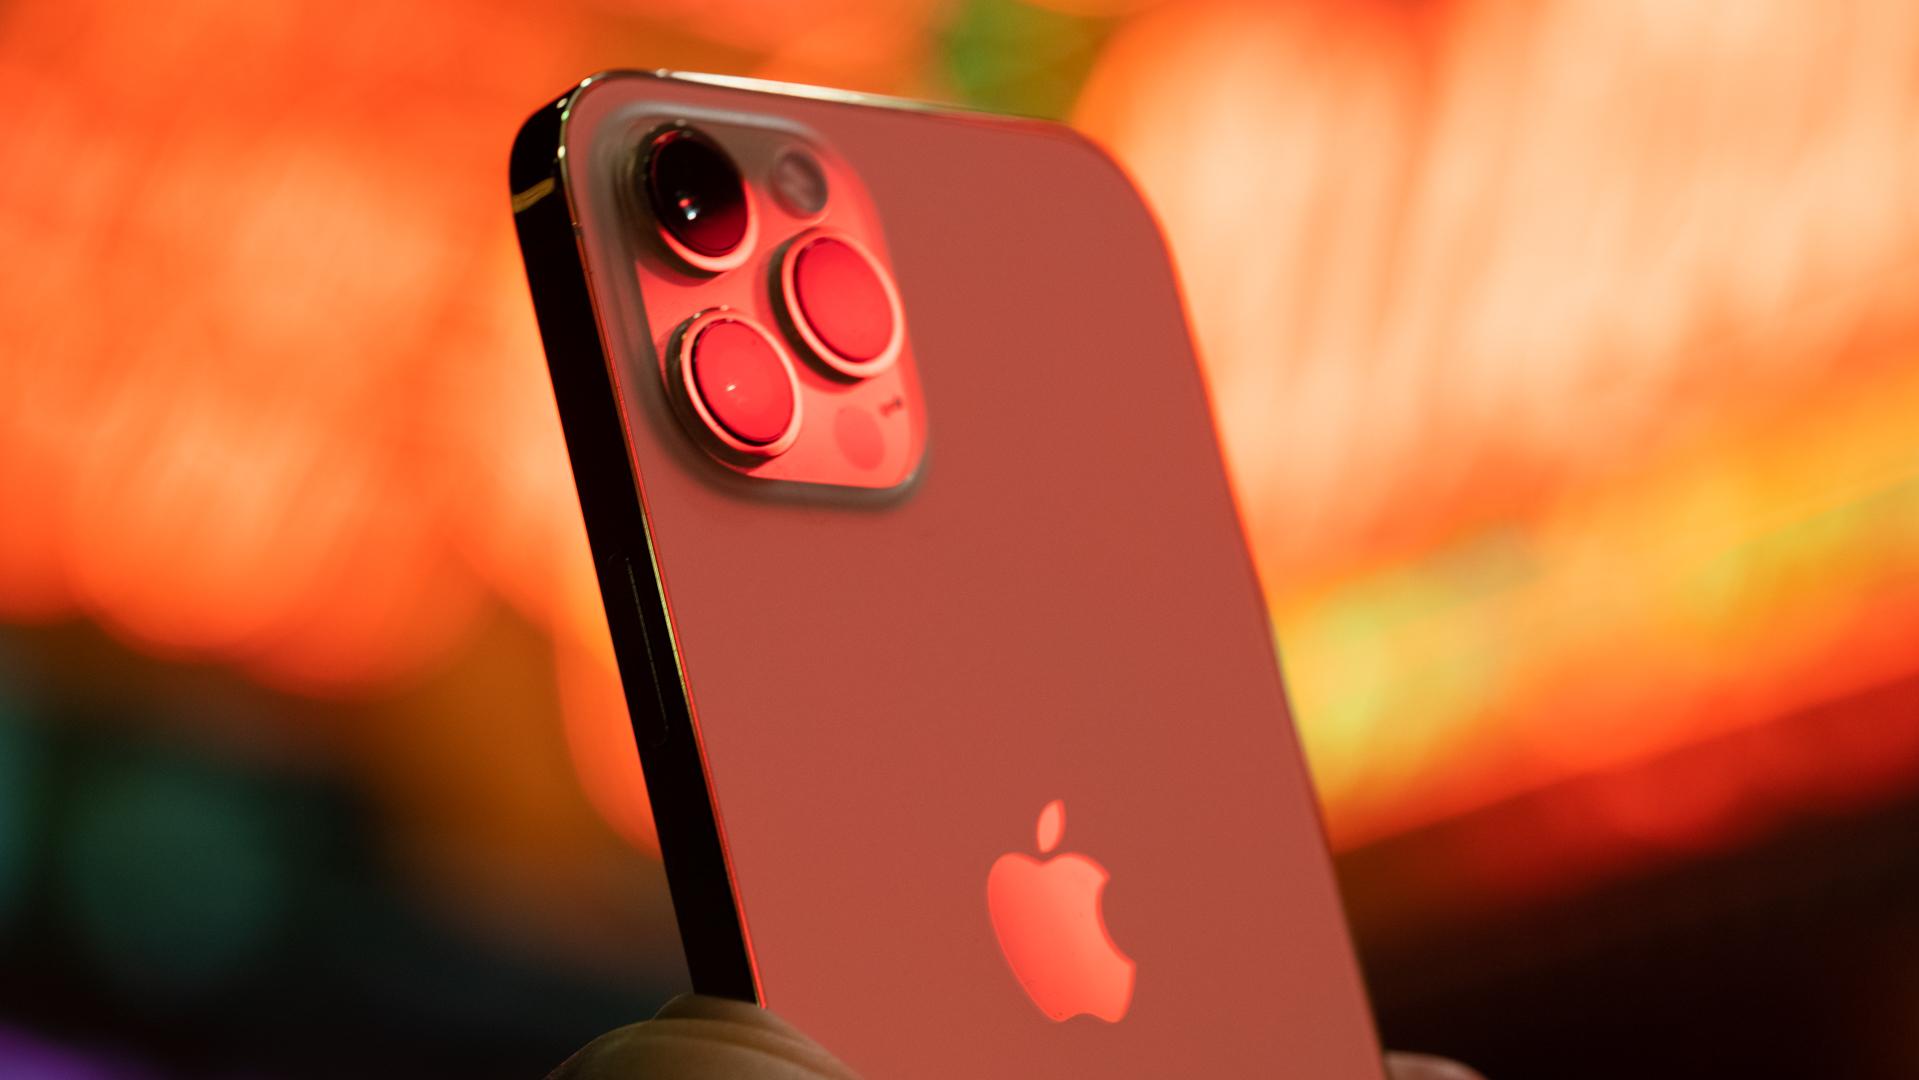 iPhone 12 Pro Max neon camera macro 2